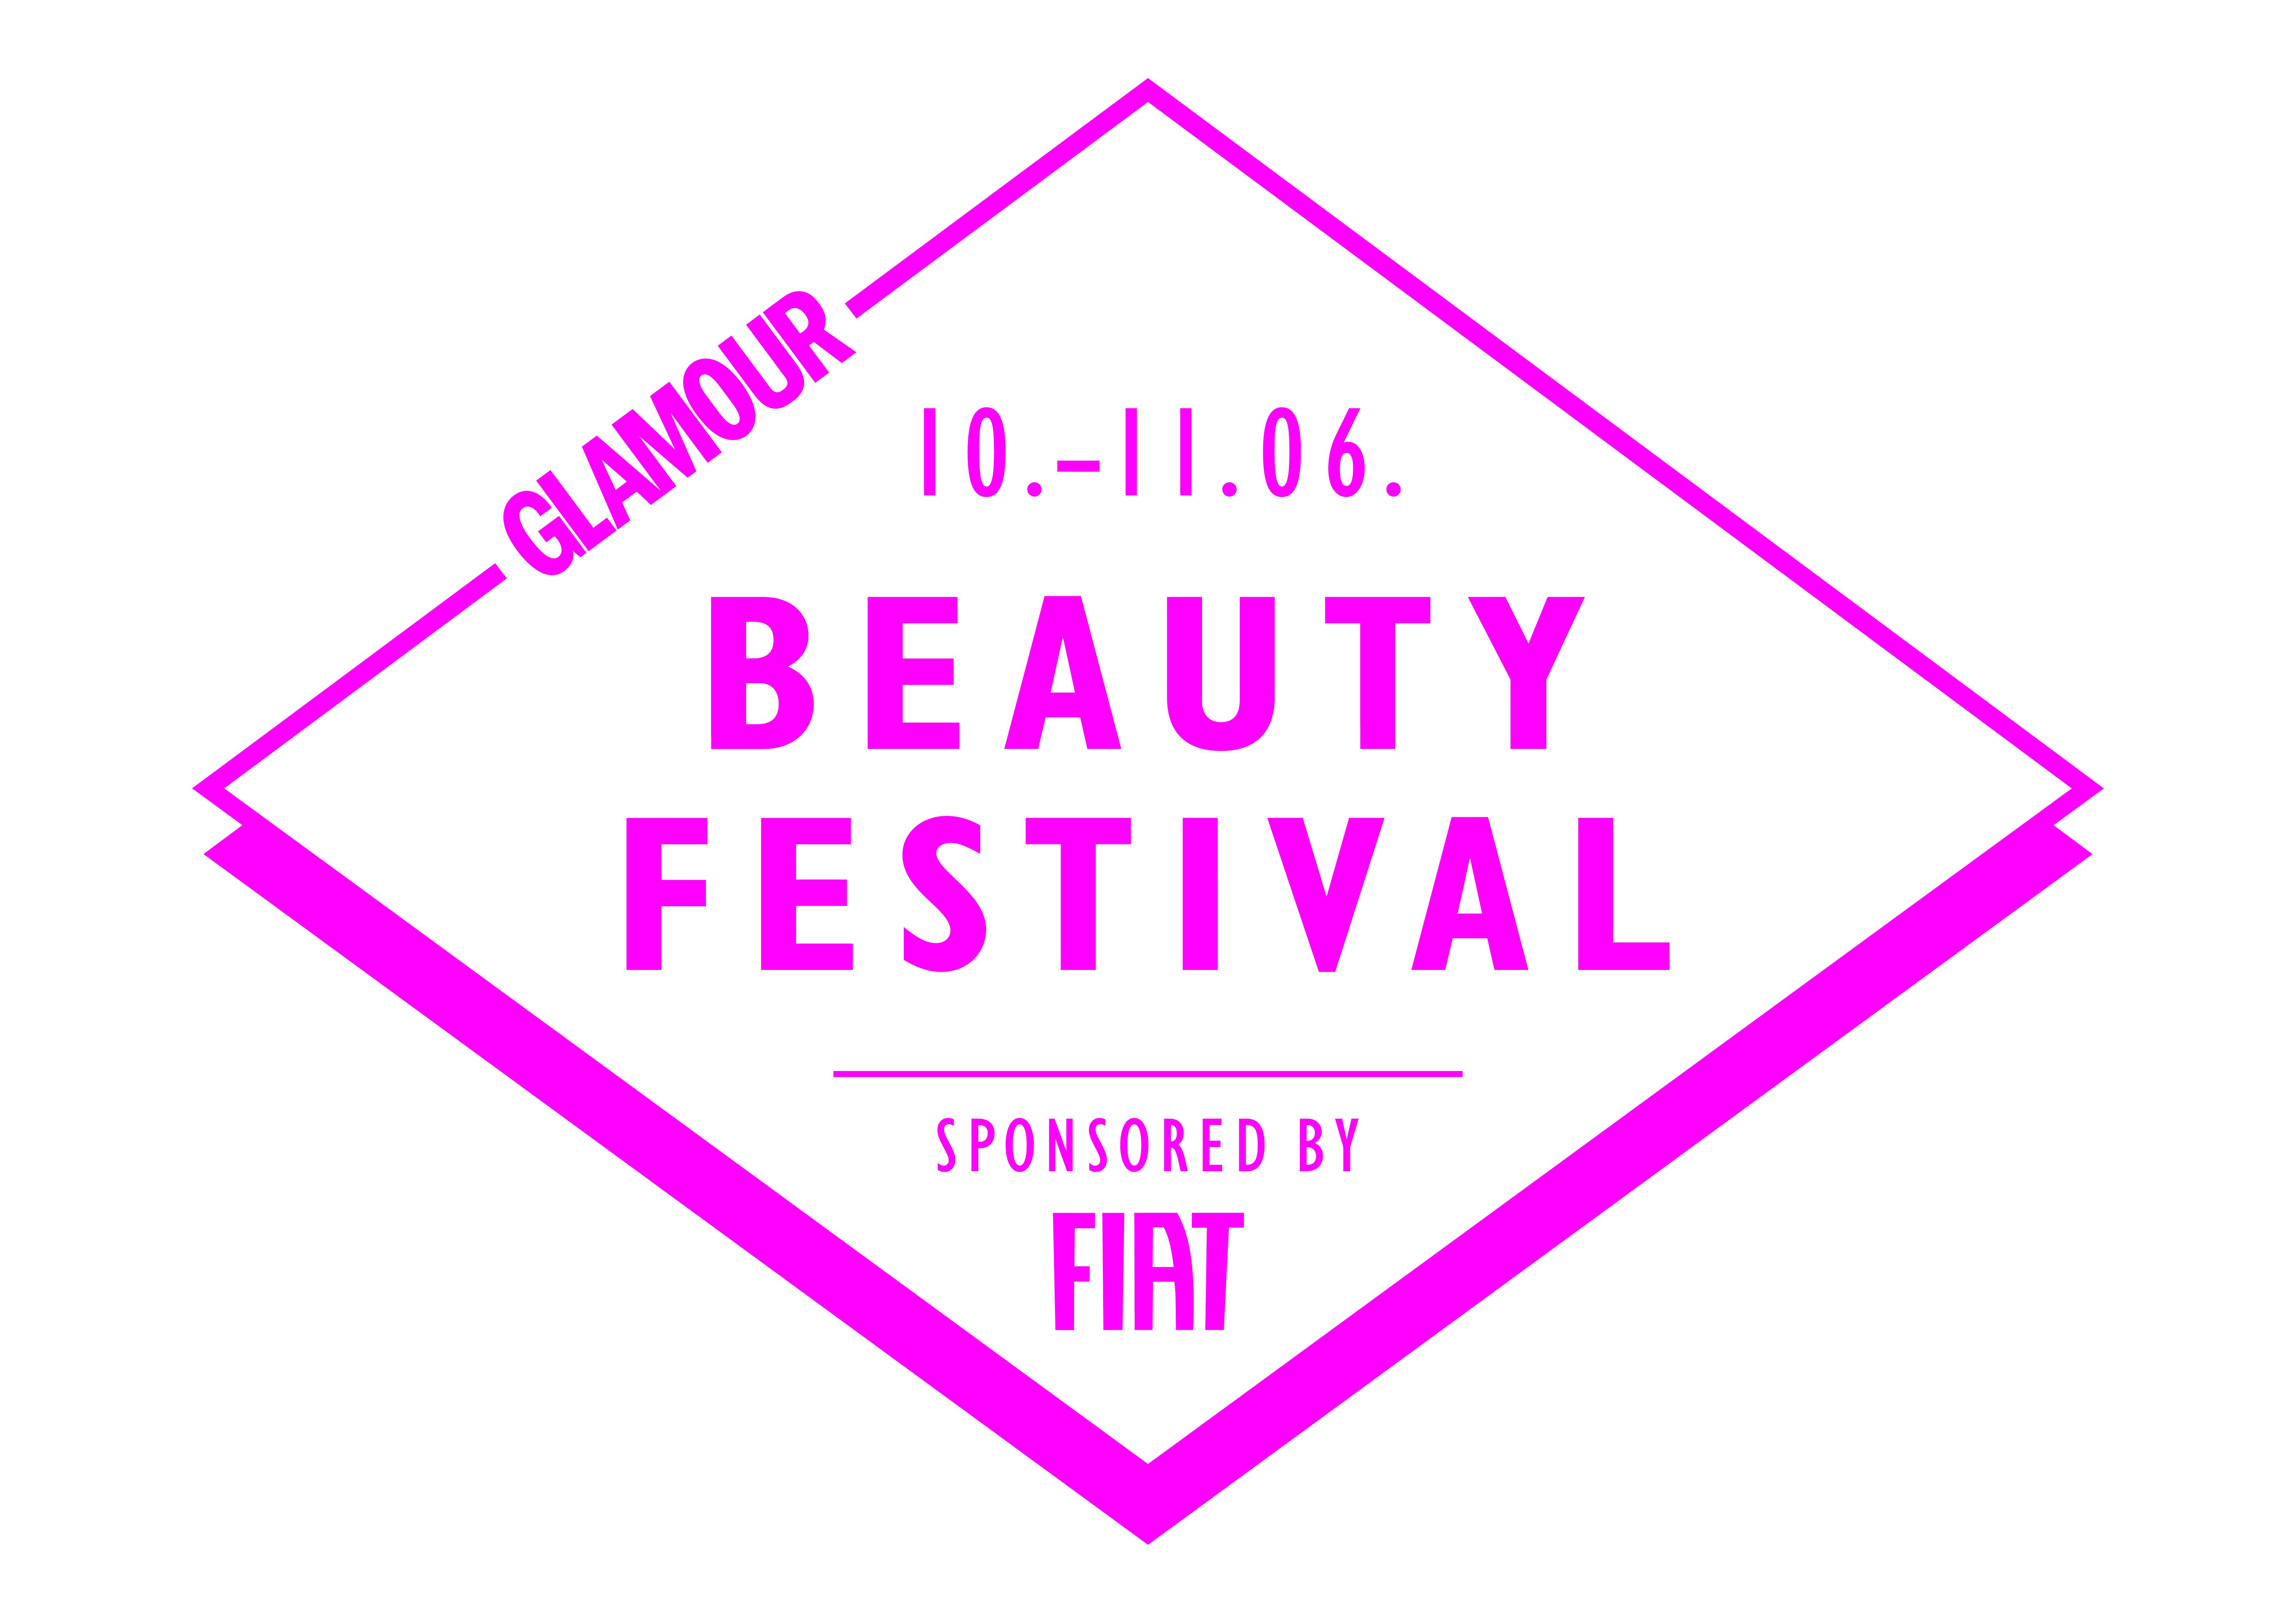 Glamour Beauty Festival 2017